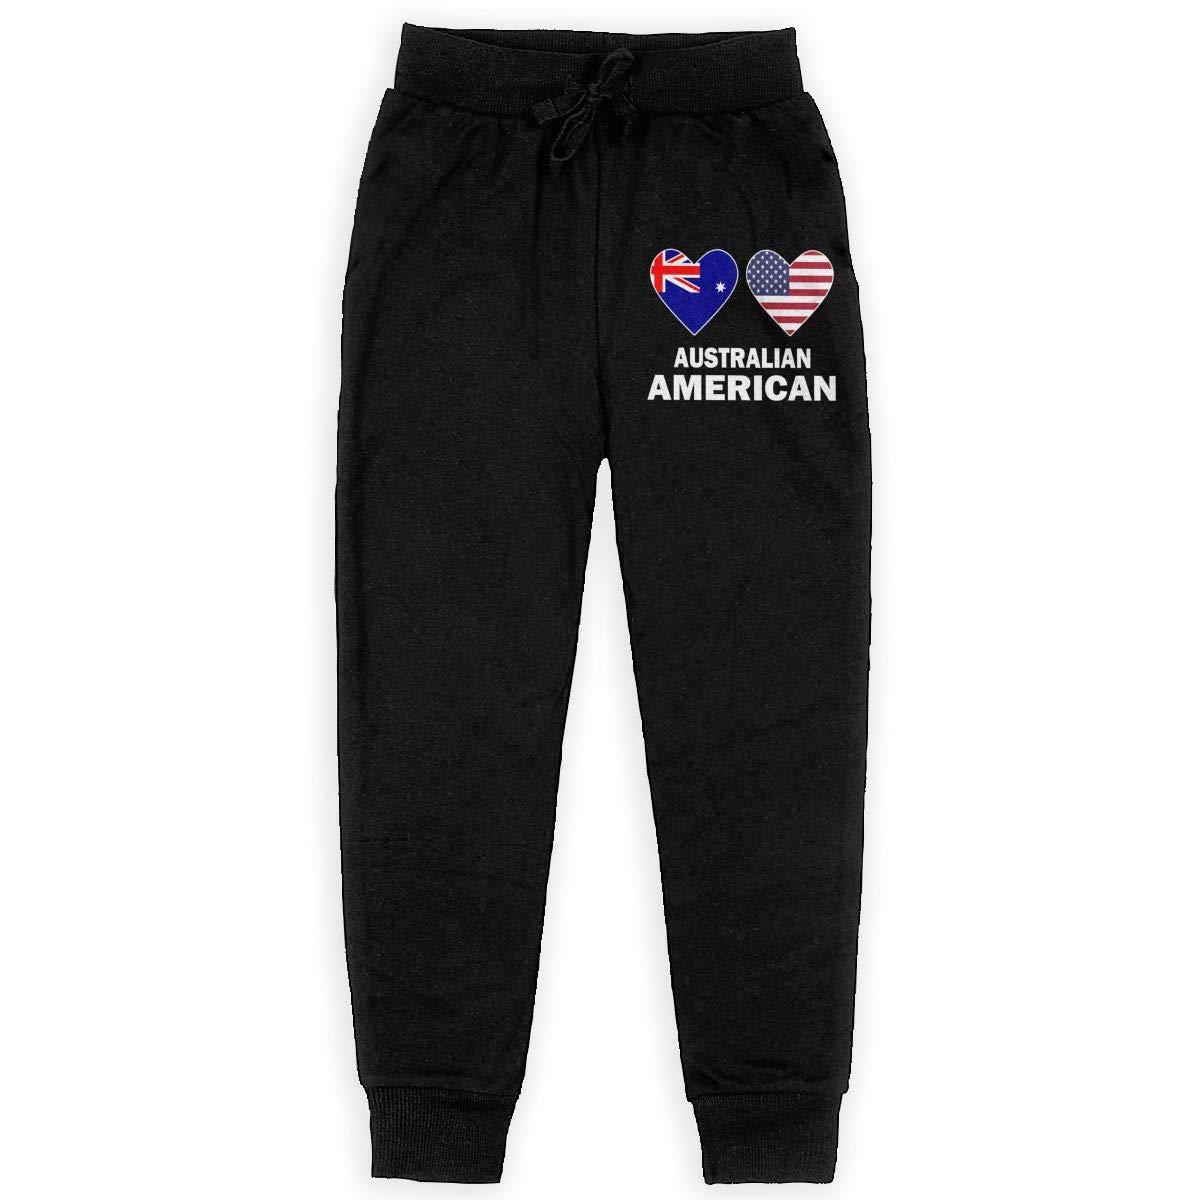 WYZVK22 Australian American Hearts Soft//Cozy Sweatpants Youth Jogger Pants Teenager Girls